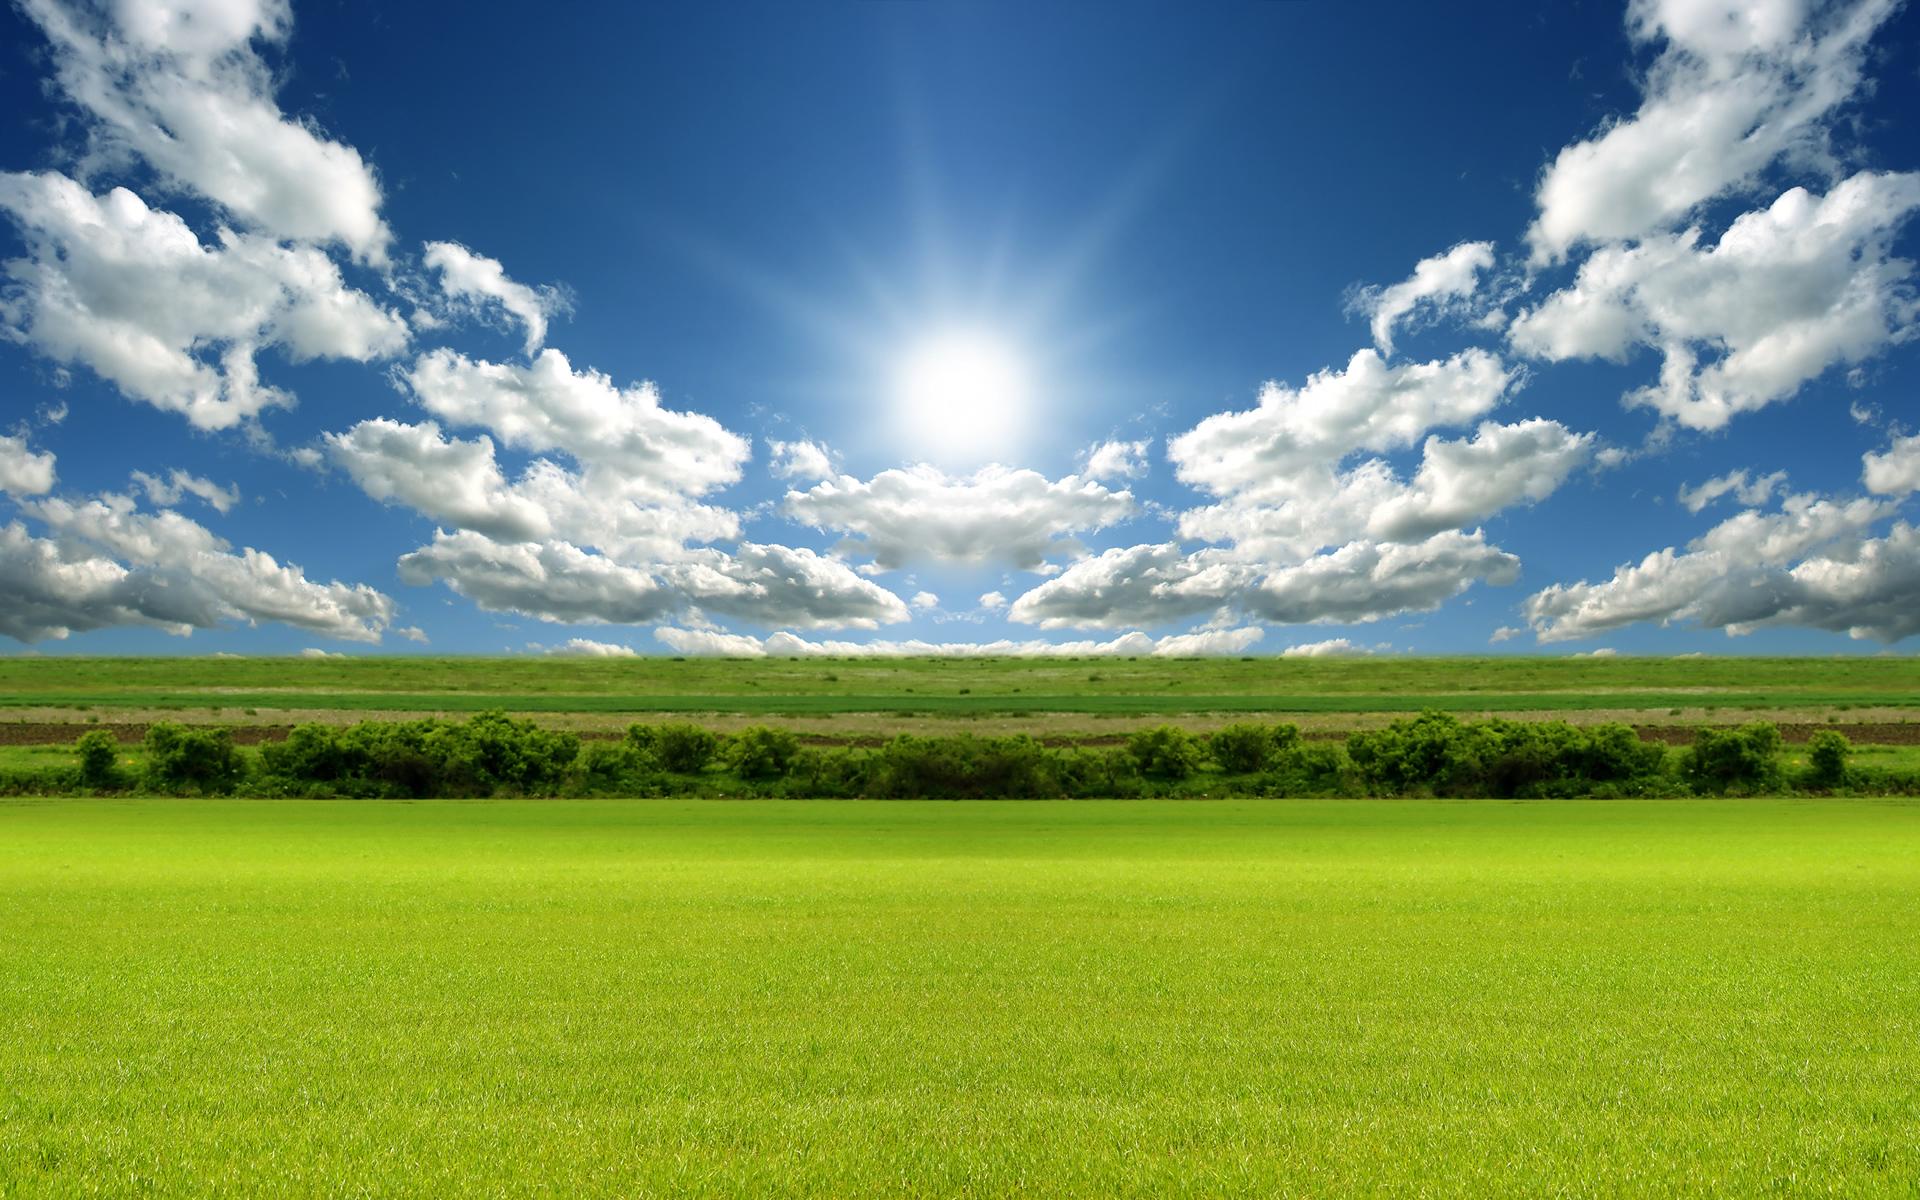 green-grass-field-wallpaper-3 – Farm Air Inc